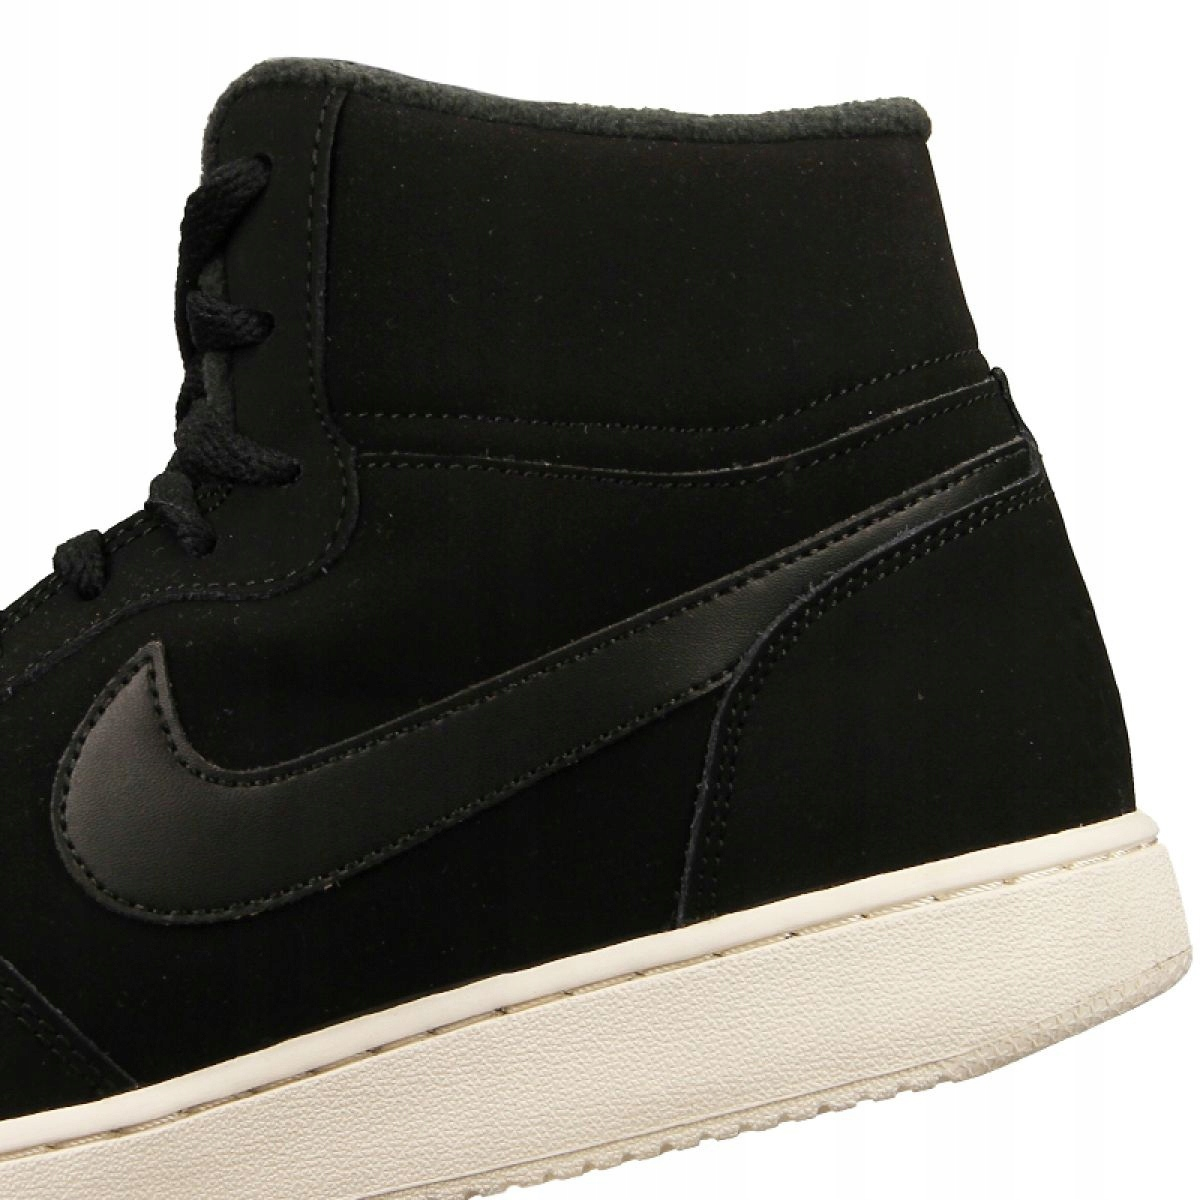 Sapatilhas Nike Ebernon Mid Se M AQ8125 001 preto